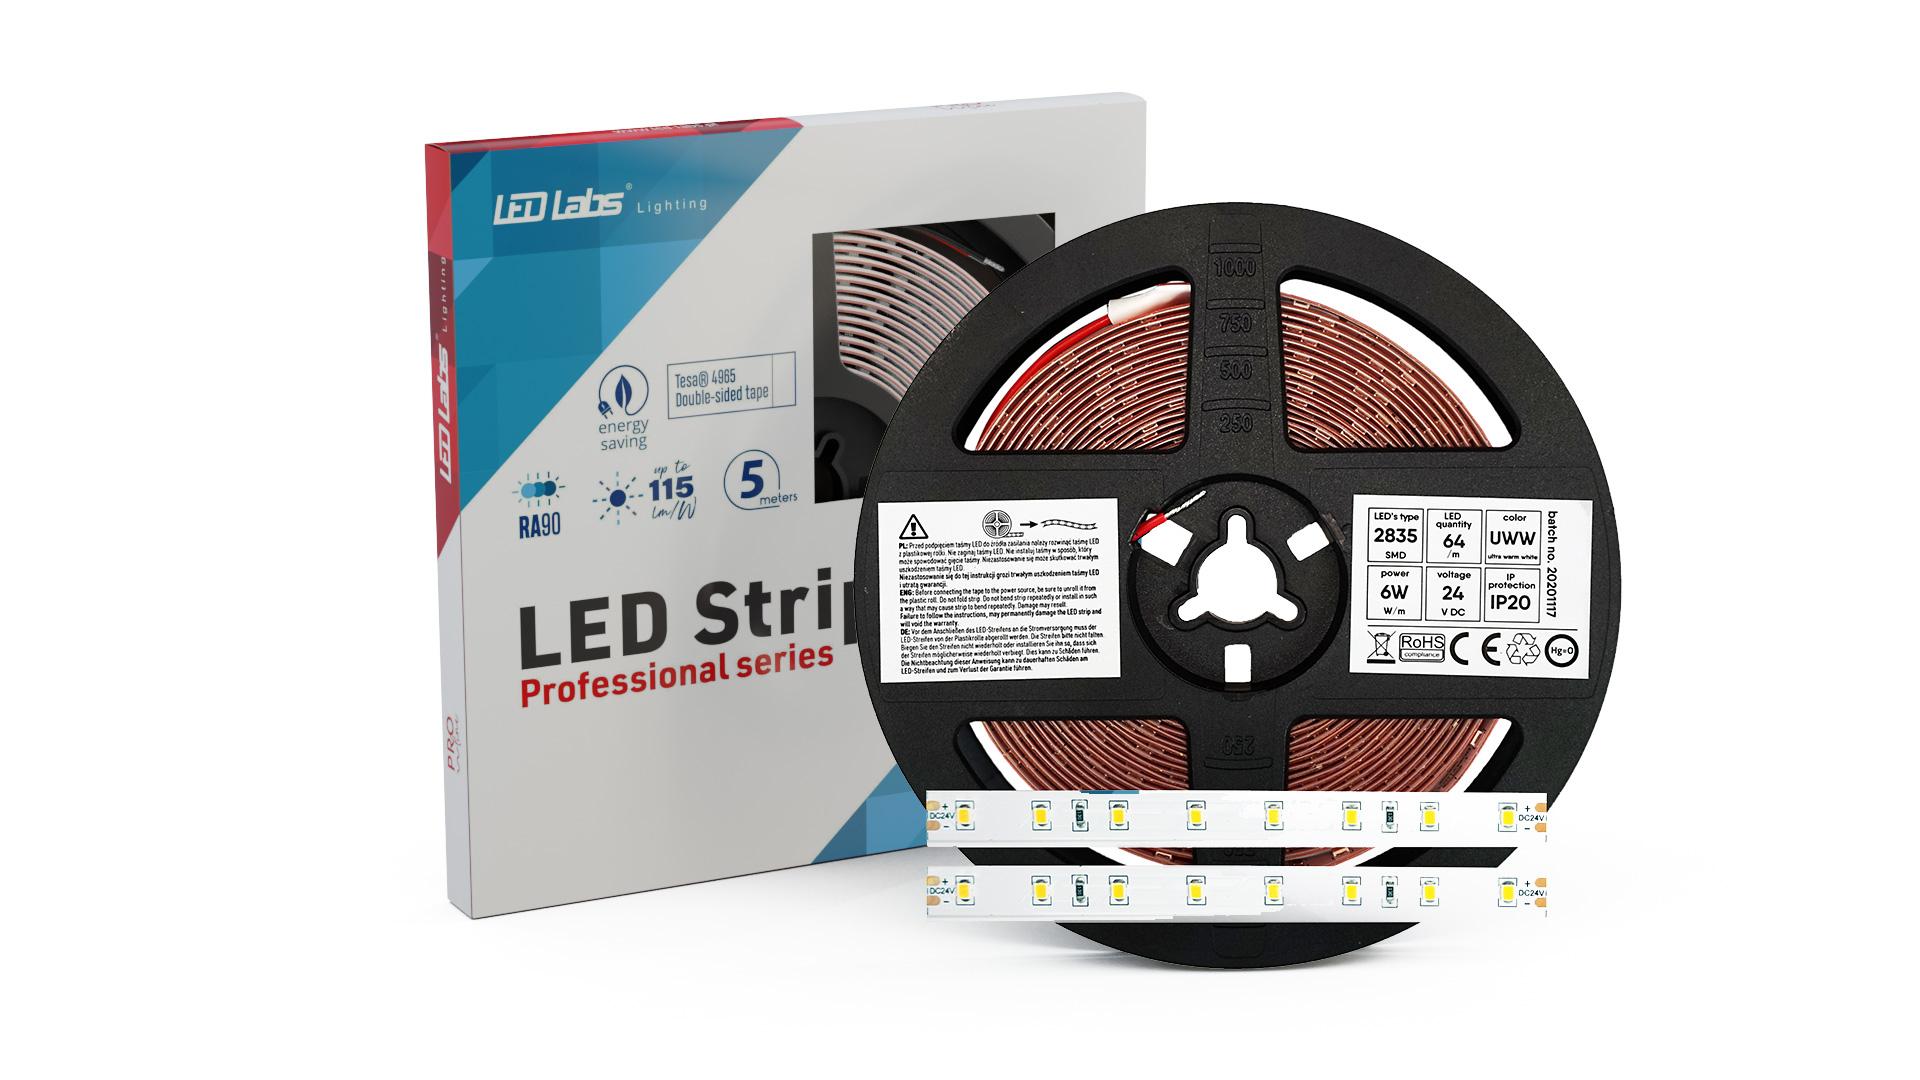 LED Strip PRO 5Y 24V 320 LED 2835 SMD 6W 10000K RA90